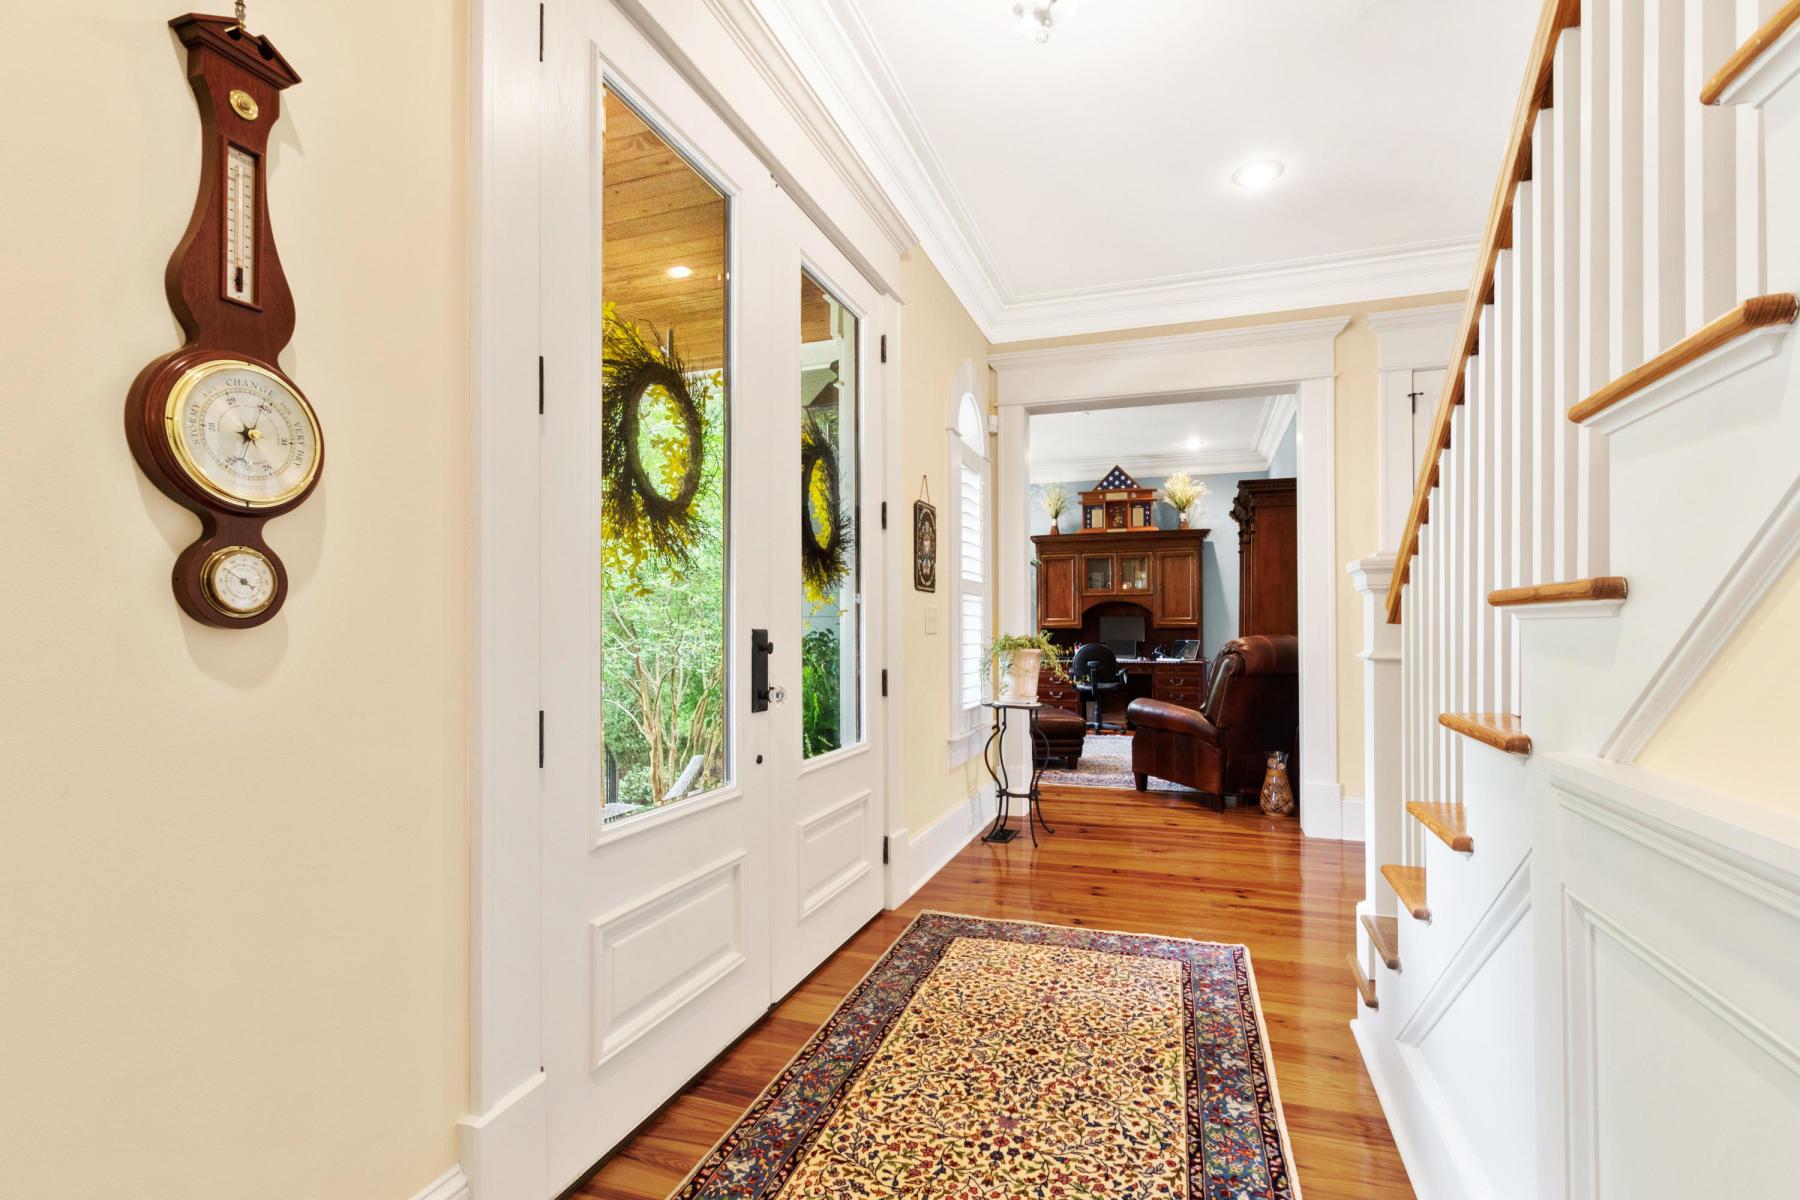 Broughton Hall Homes For Sale - 2058 Lakeshore, Pinopolis, SC - 42